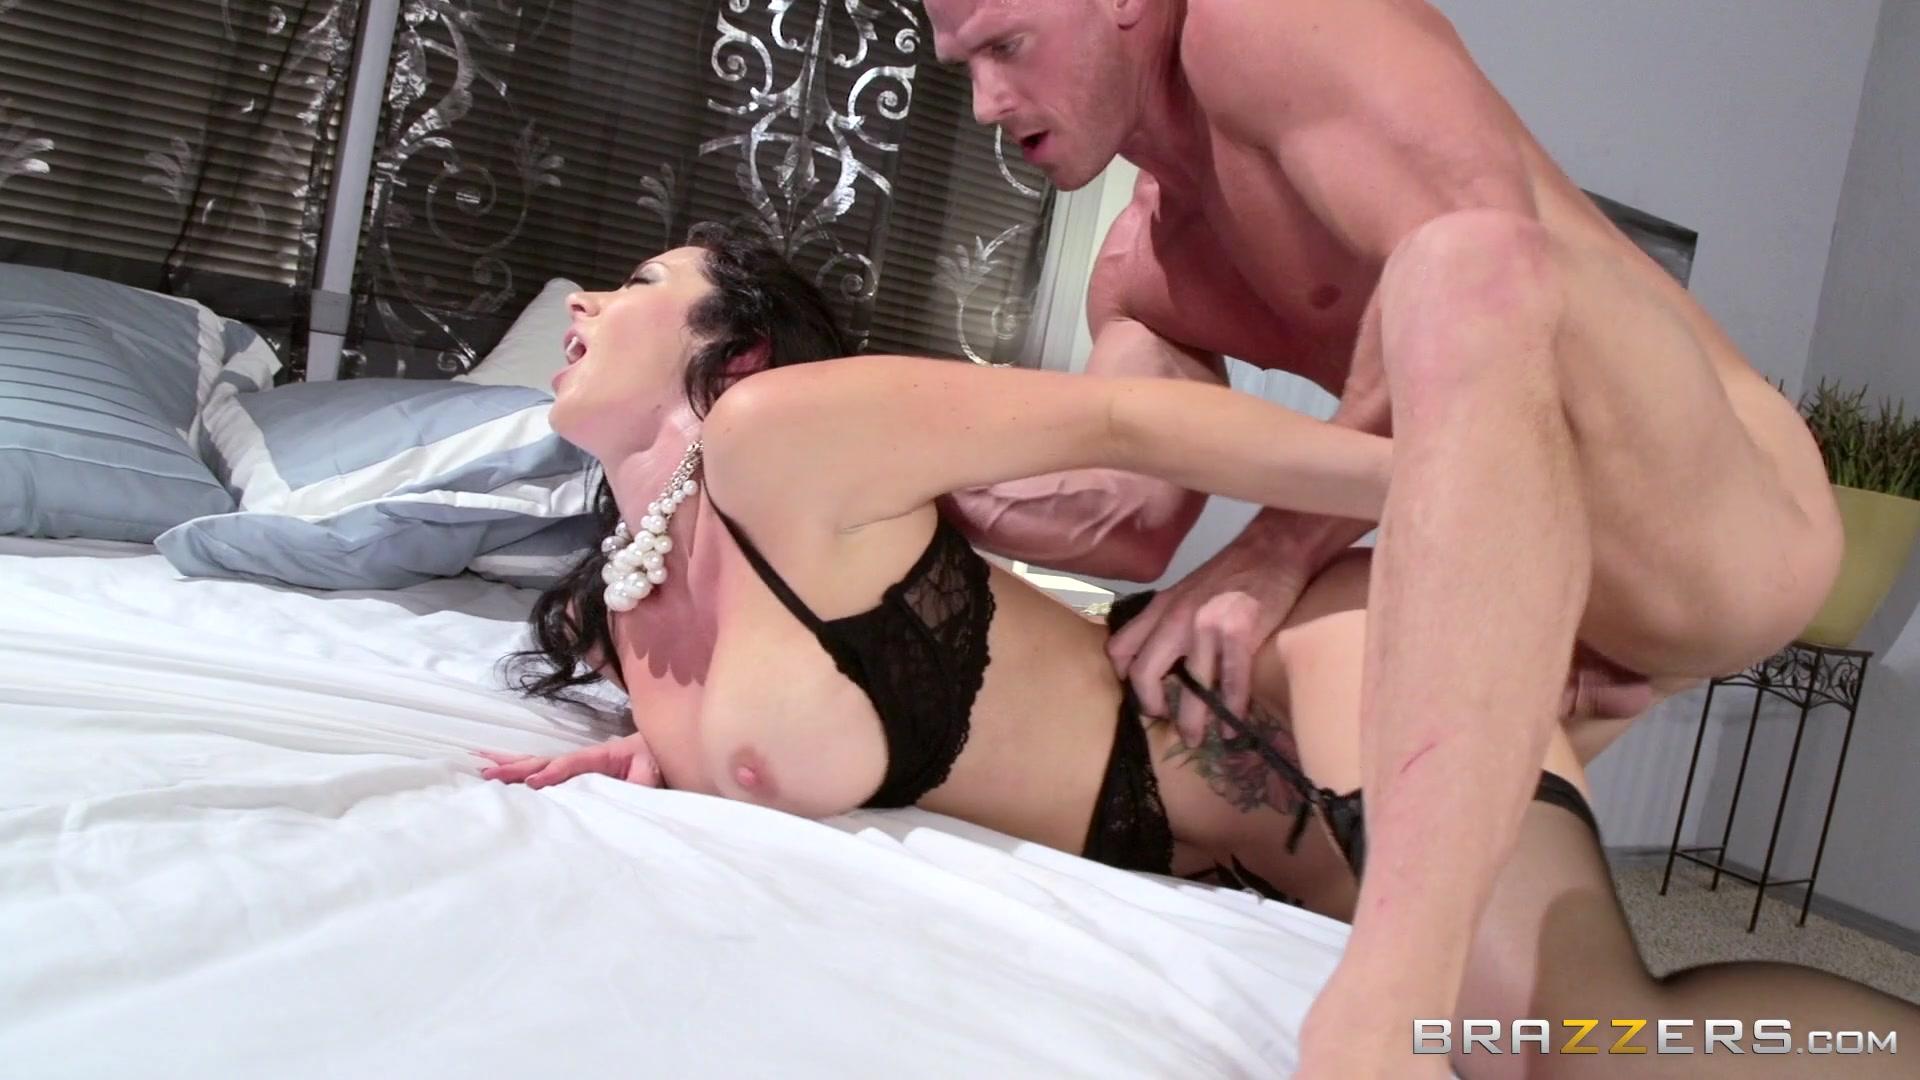 Секс с джеймс бондом, Джейн Блонд DD7 German Movie - Jane Blond 007 14 фотография